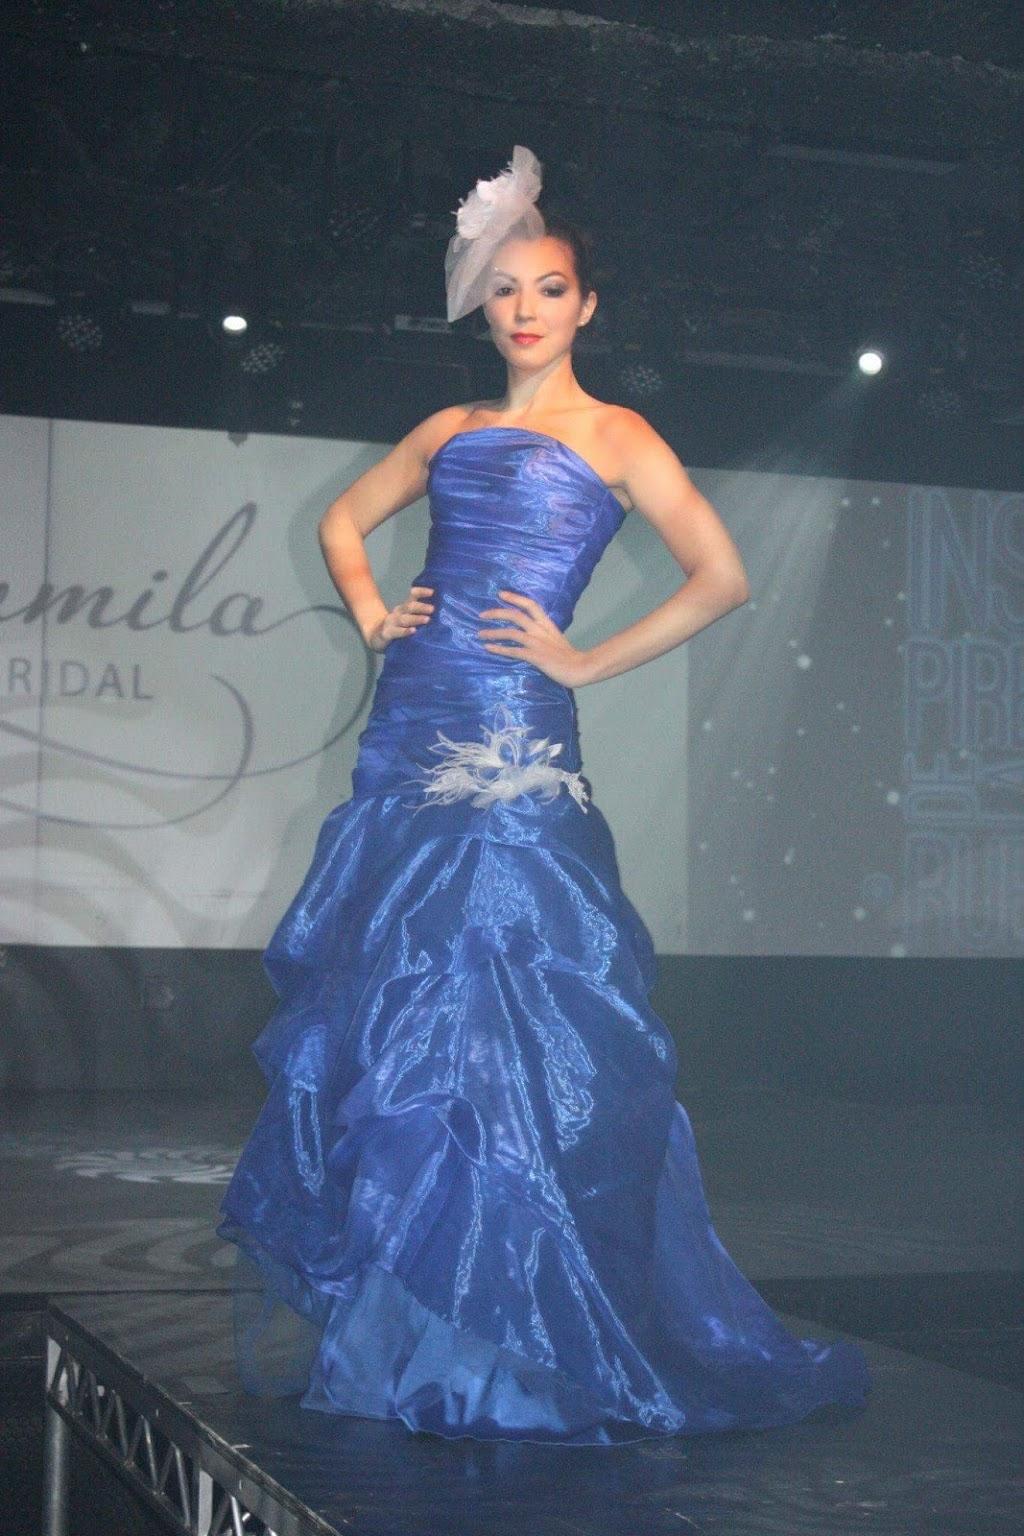 Djamila Bridal | point of interest | 5950 Victoria Dr, Vancouver, BC V5P 3X2, Canada | 6047239492 OR +1 604-723-9492